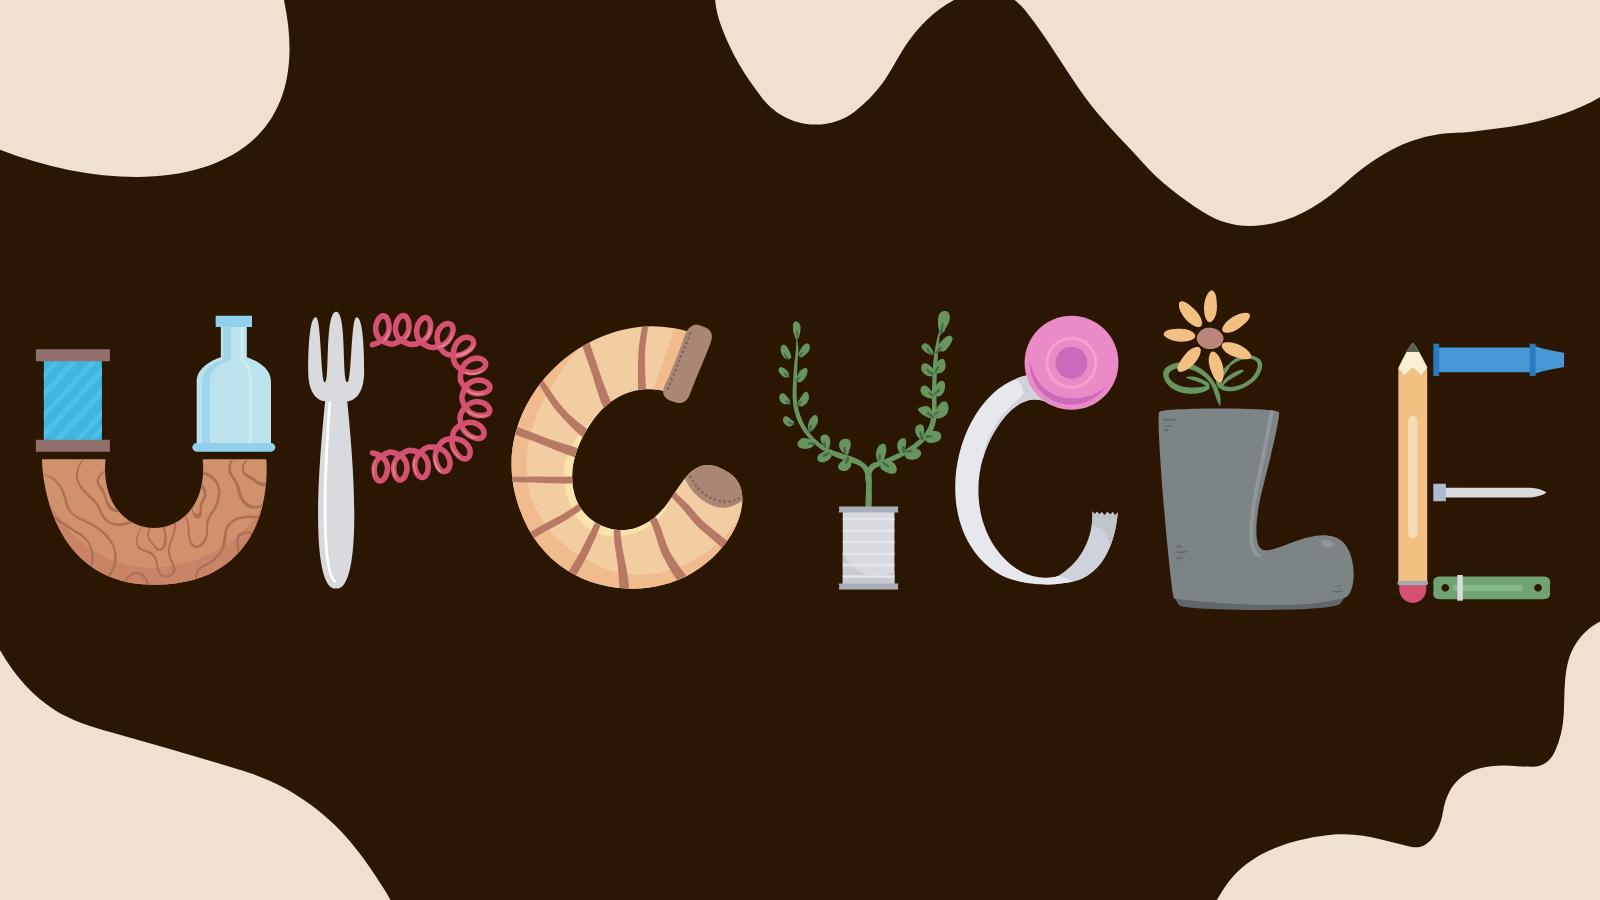 Upcycle, Tummoc, Tummoc app, recycle